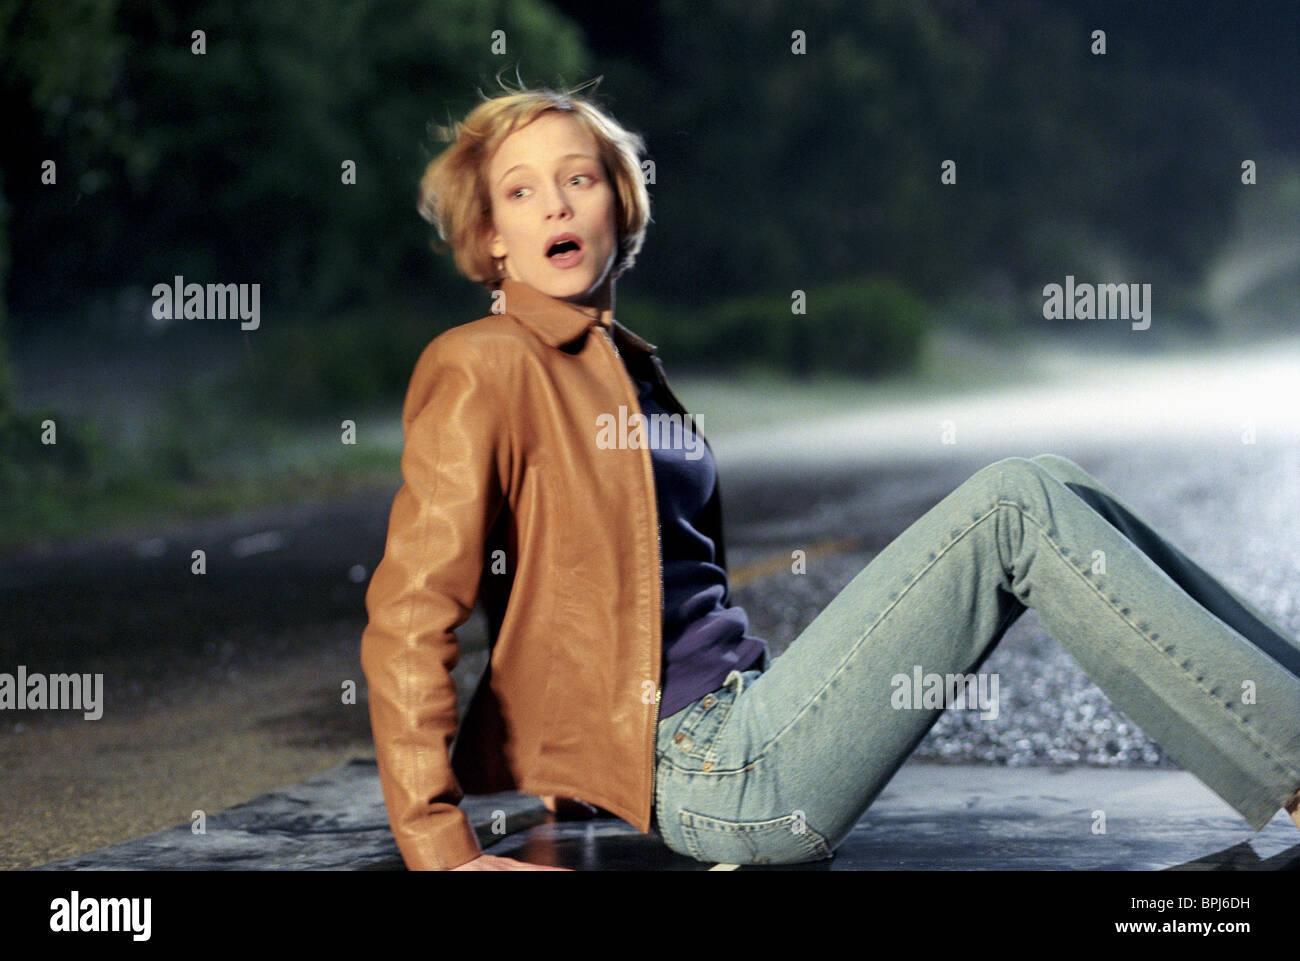 Barbara Tabita,Clare Bowen Adult pics & movies Tina Holmes,Anne-Louise Lambert